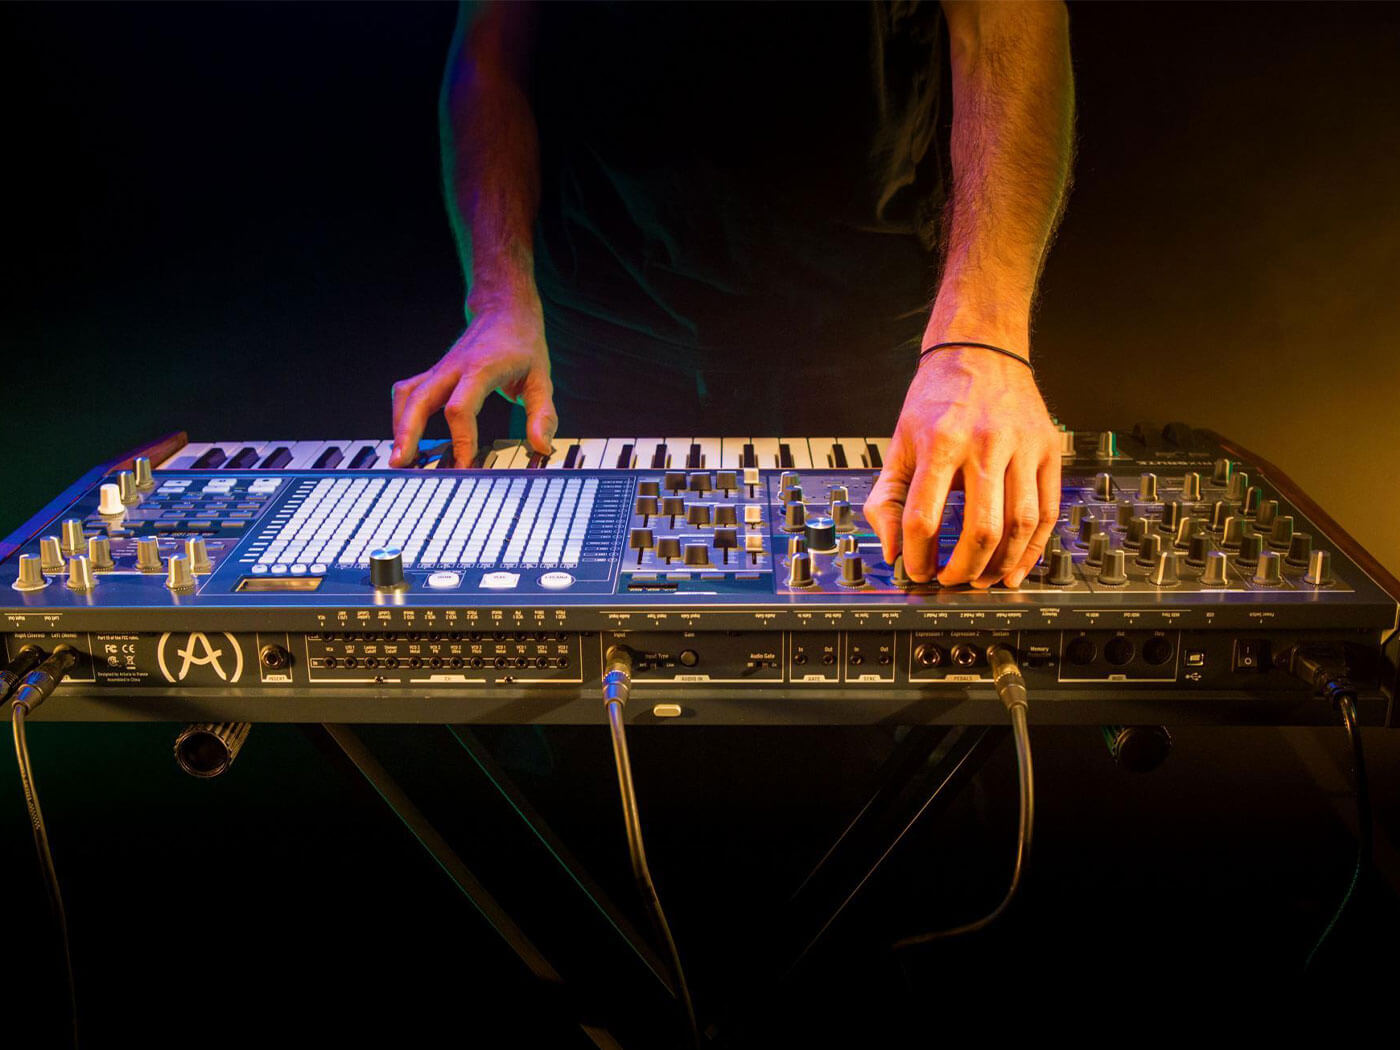 Arturia MatrixBrute gets a major update to version 2.0 - MusicTech